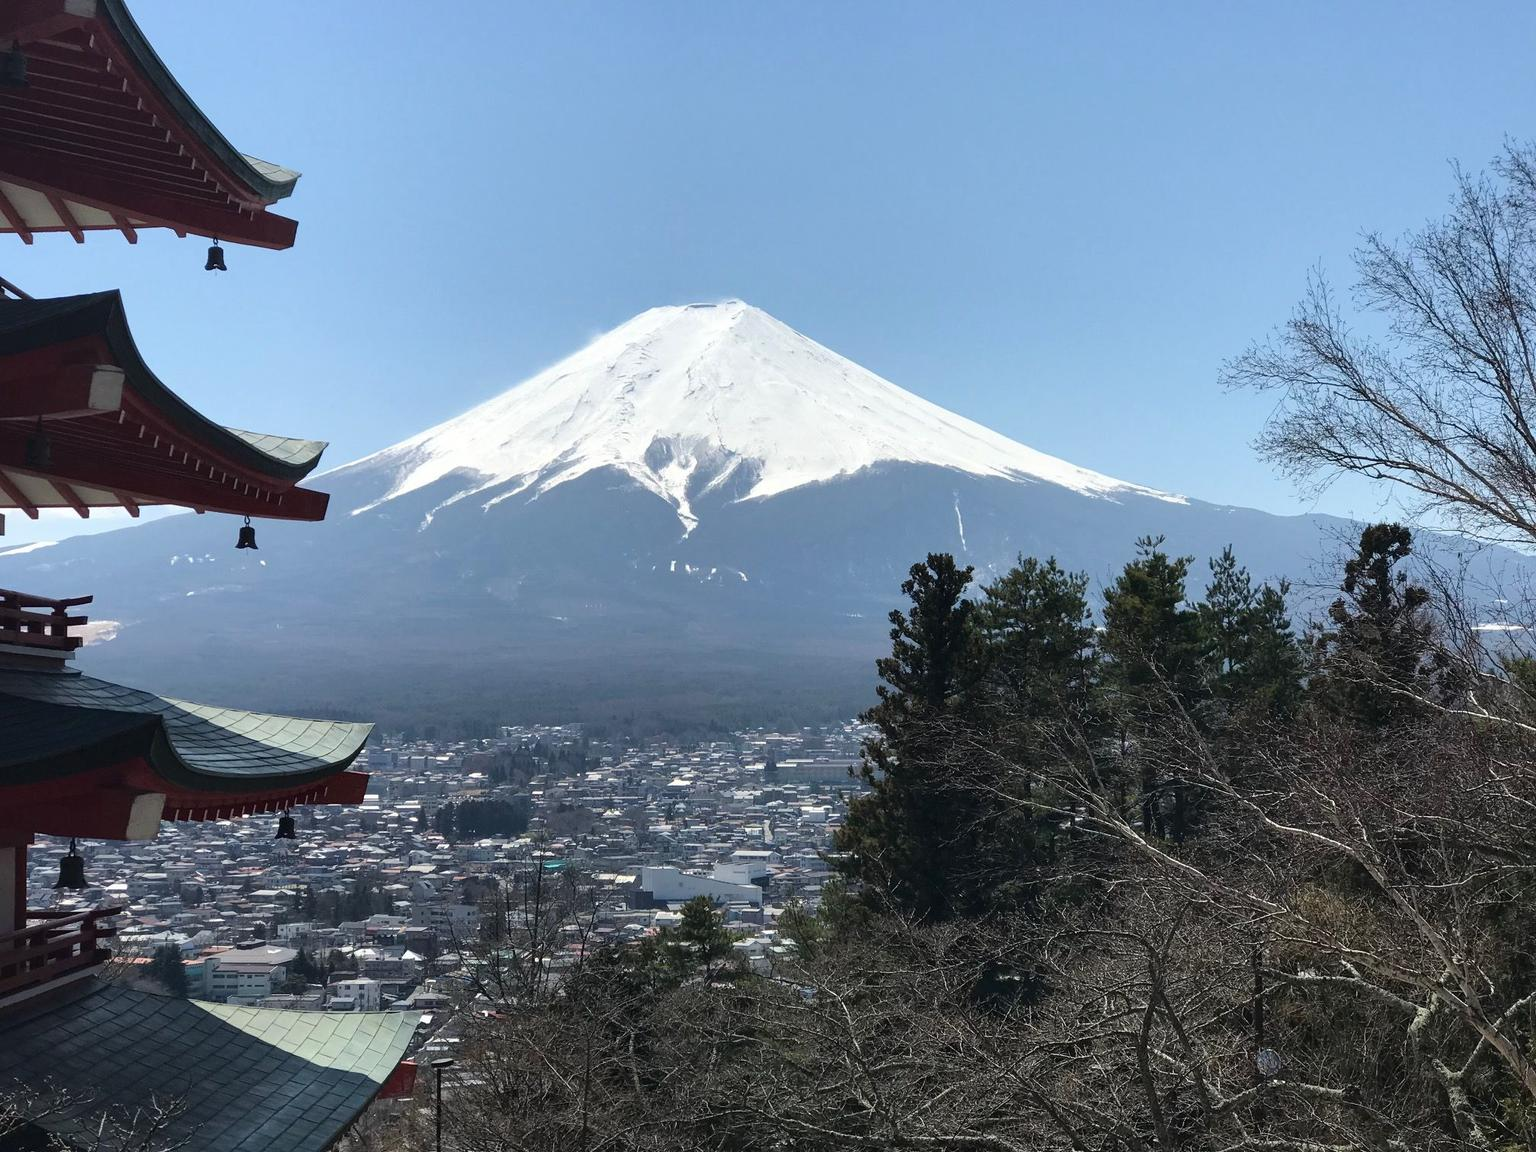 MÁS FOTOS, Private Tour: Chartered Car to Mt. Fuji Lake Kawaguchiko or Hakone and Lake Ashi